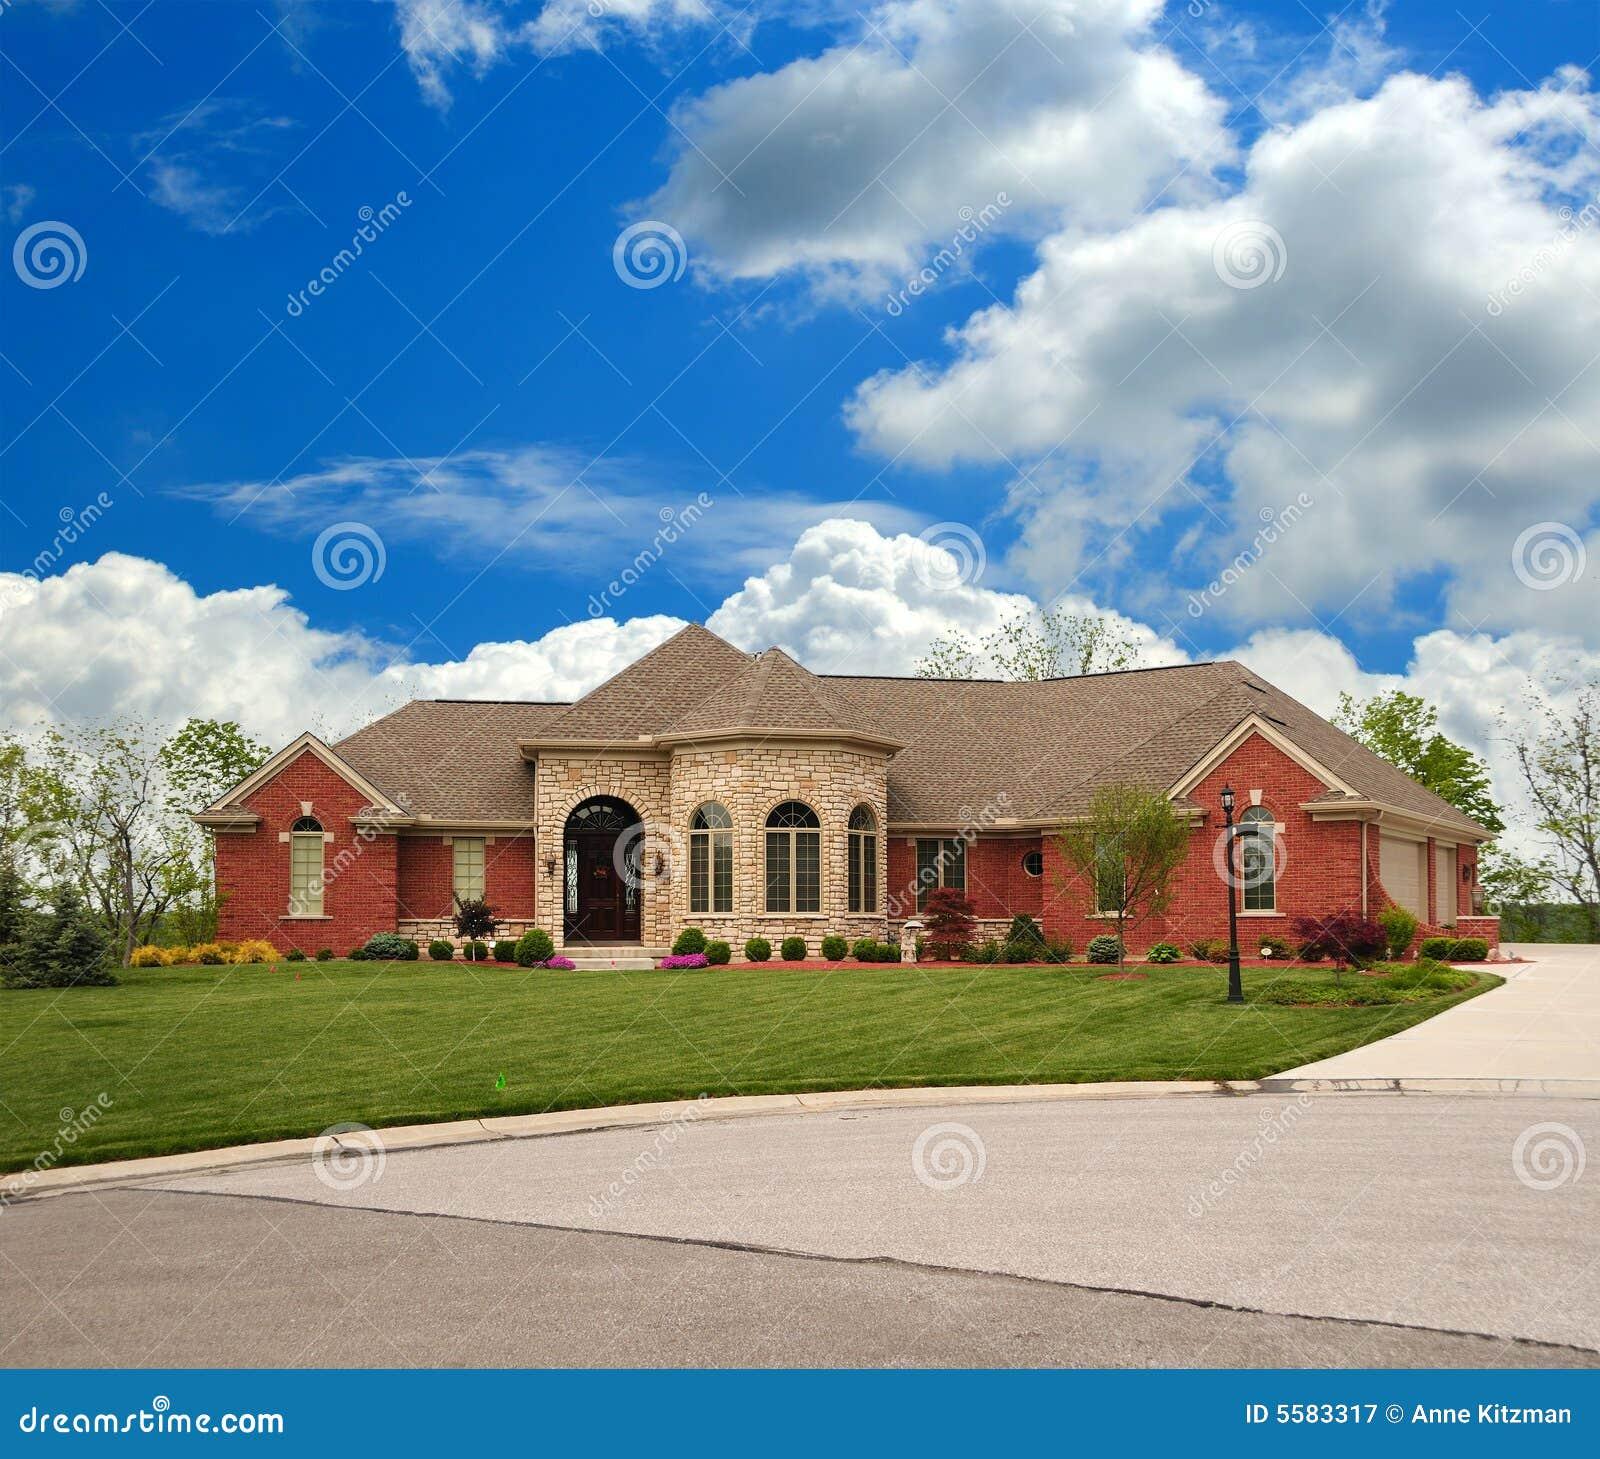 Luxury Brick Homes: Brick Suburban Ranch Home Stock Image. Image Of Real